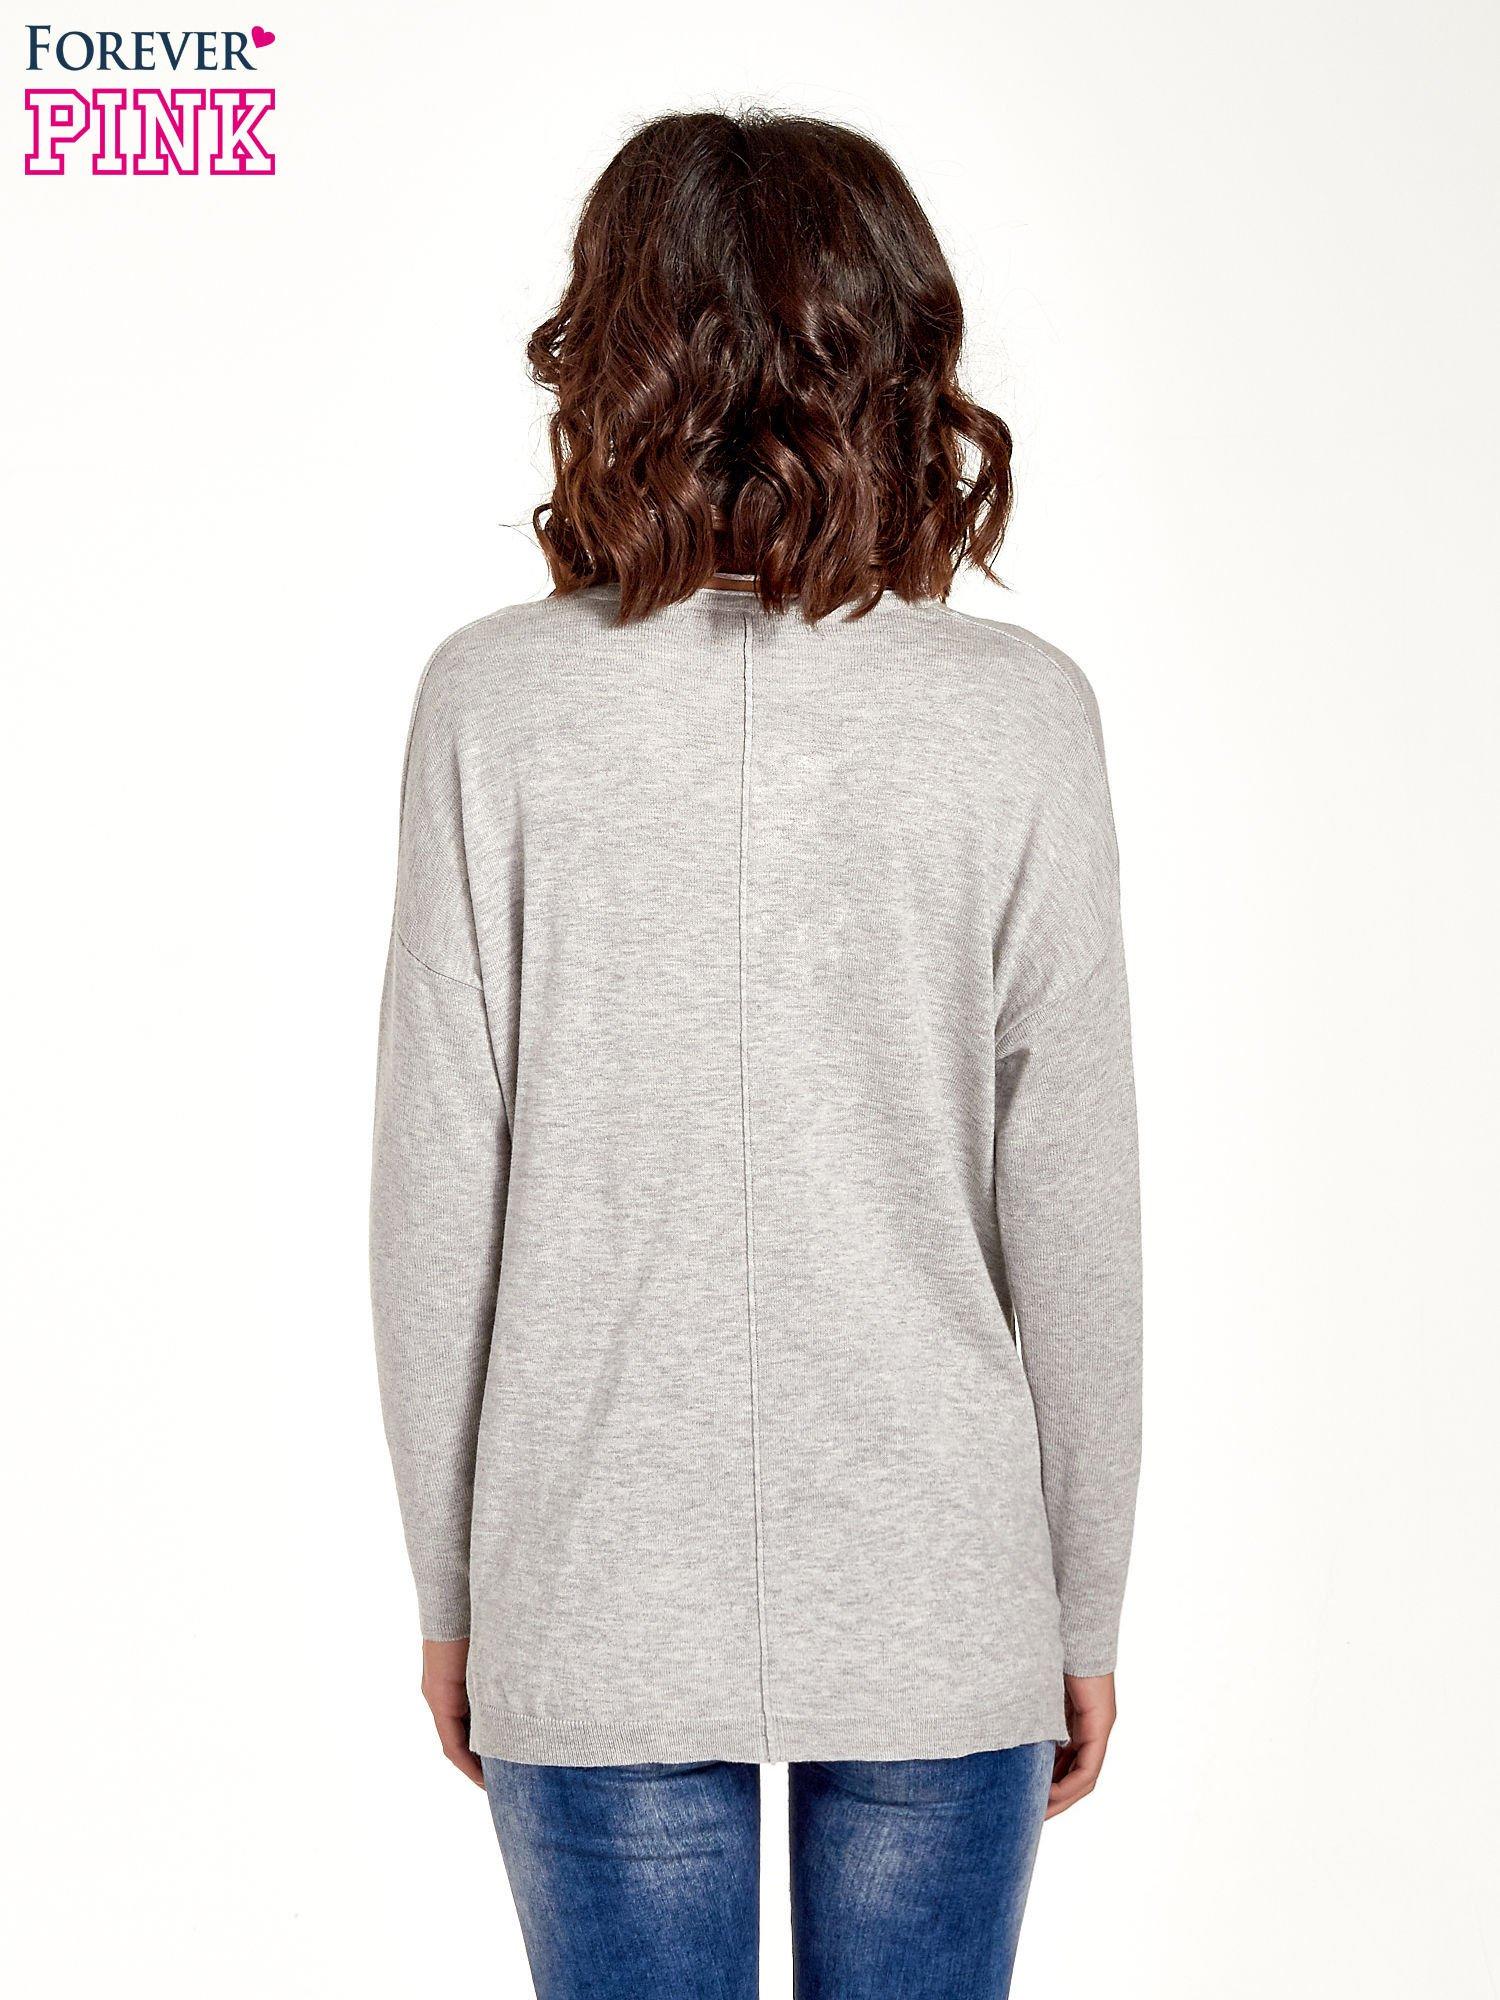 Jasnoszary sweter V-neck z rozporkami